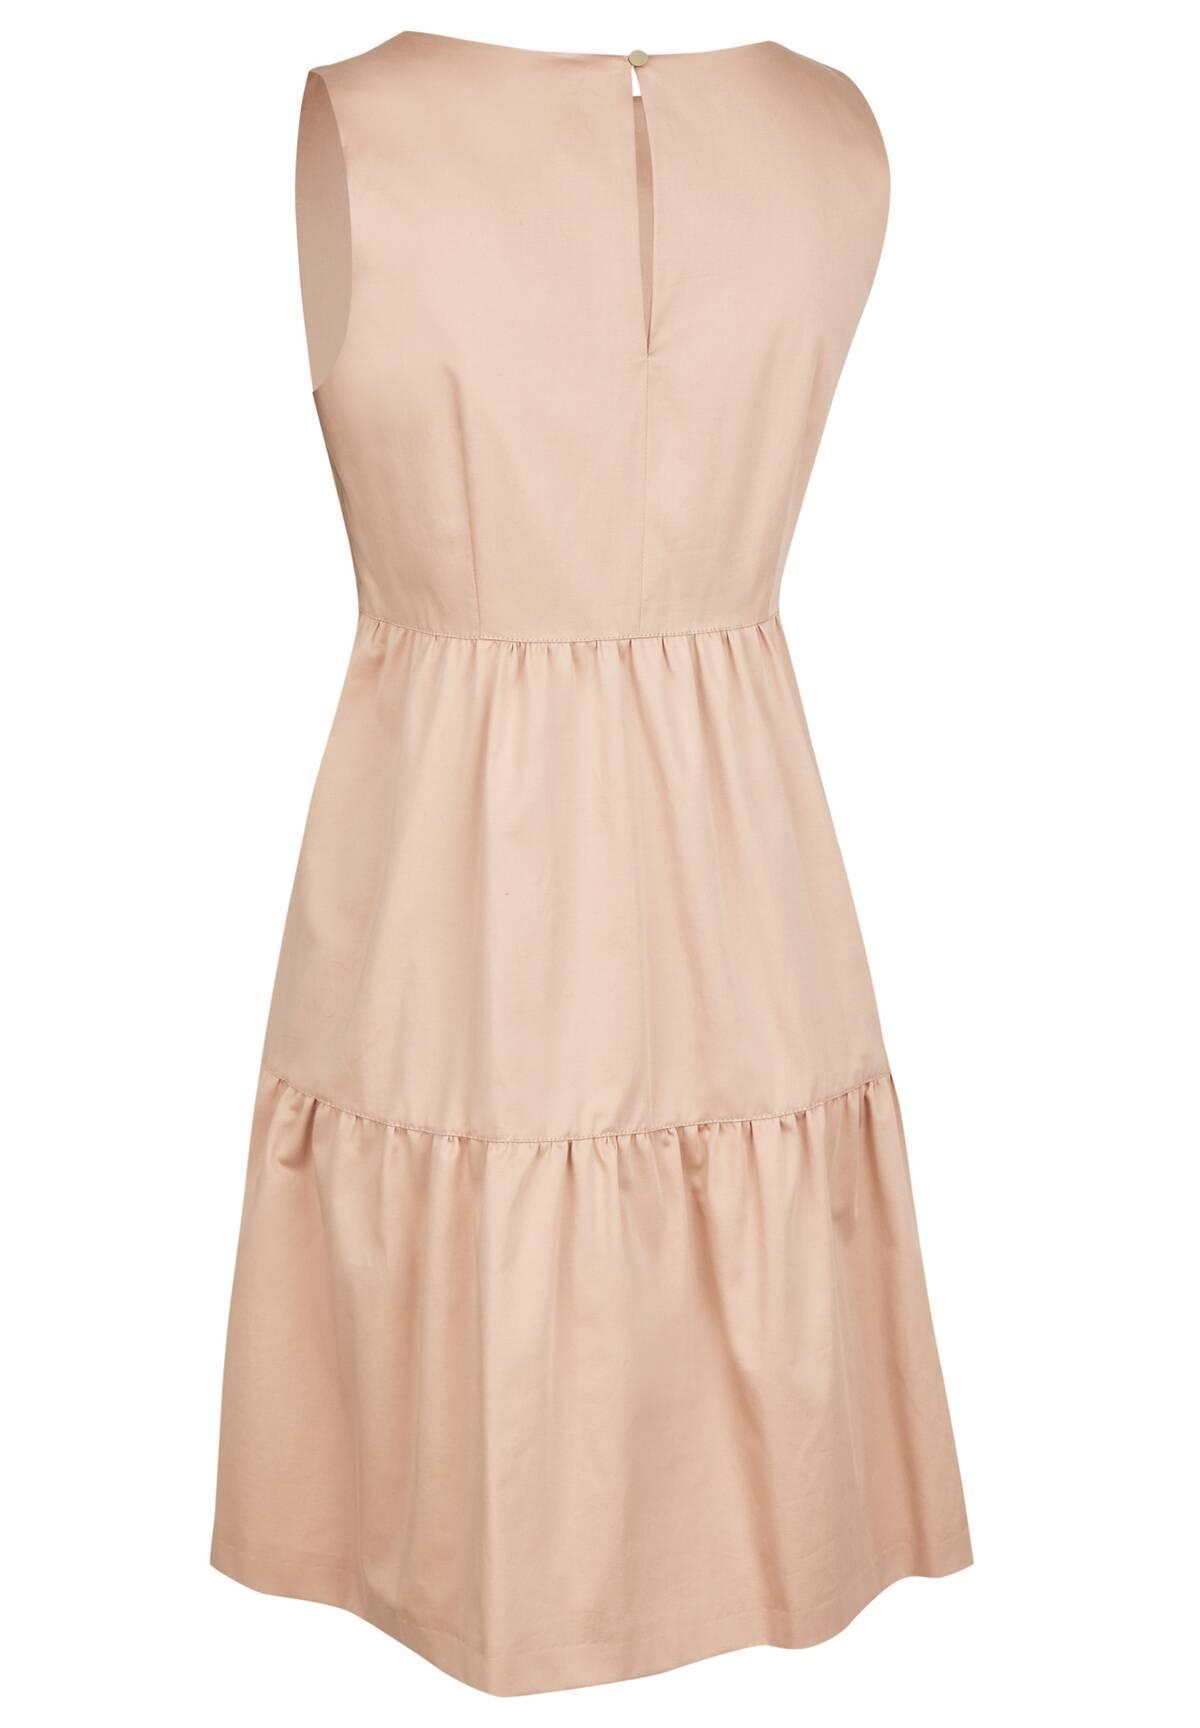 Feminines Babydoll Kleid / Dress